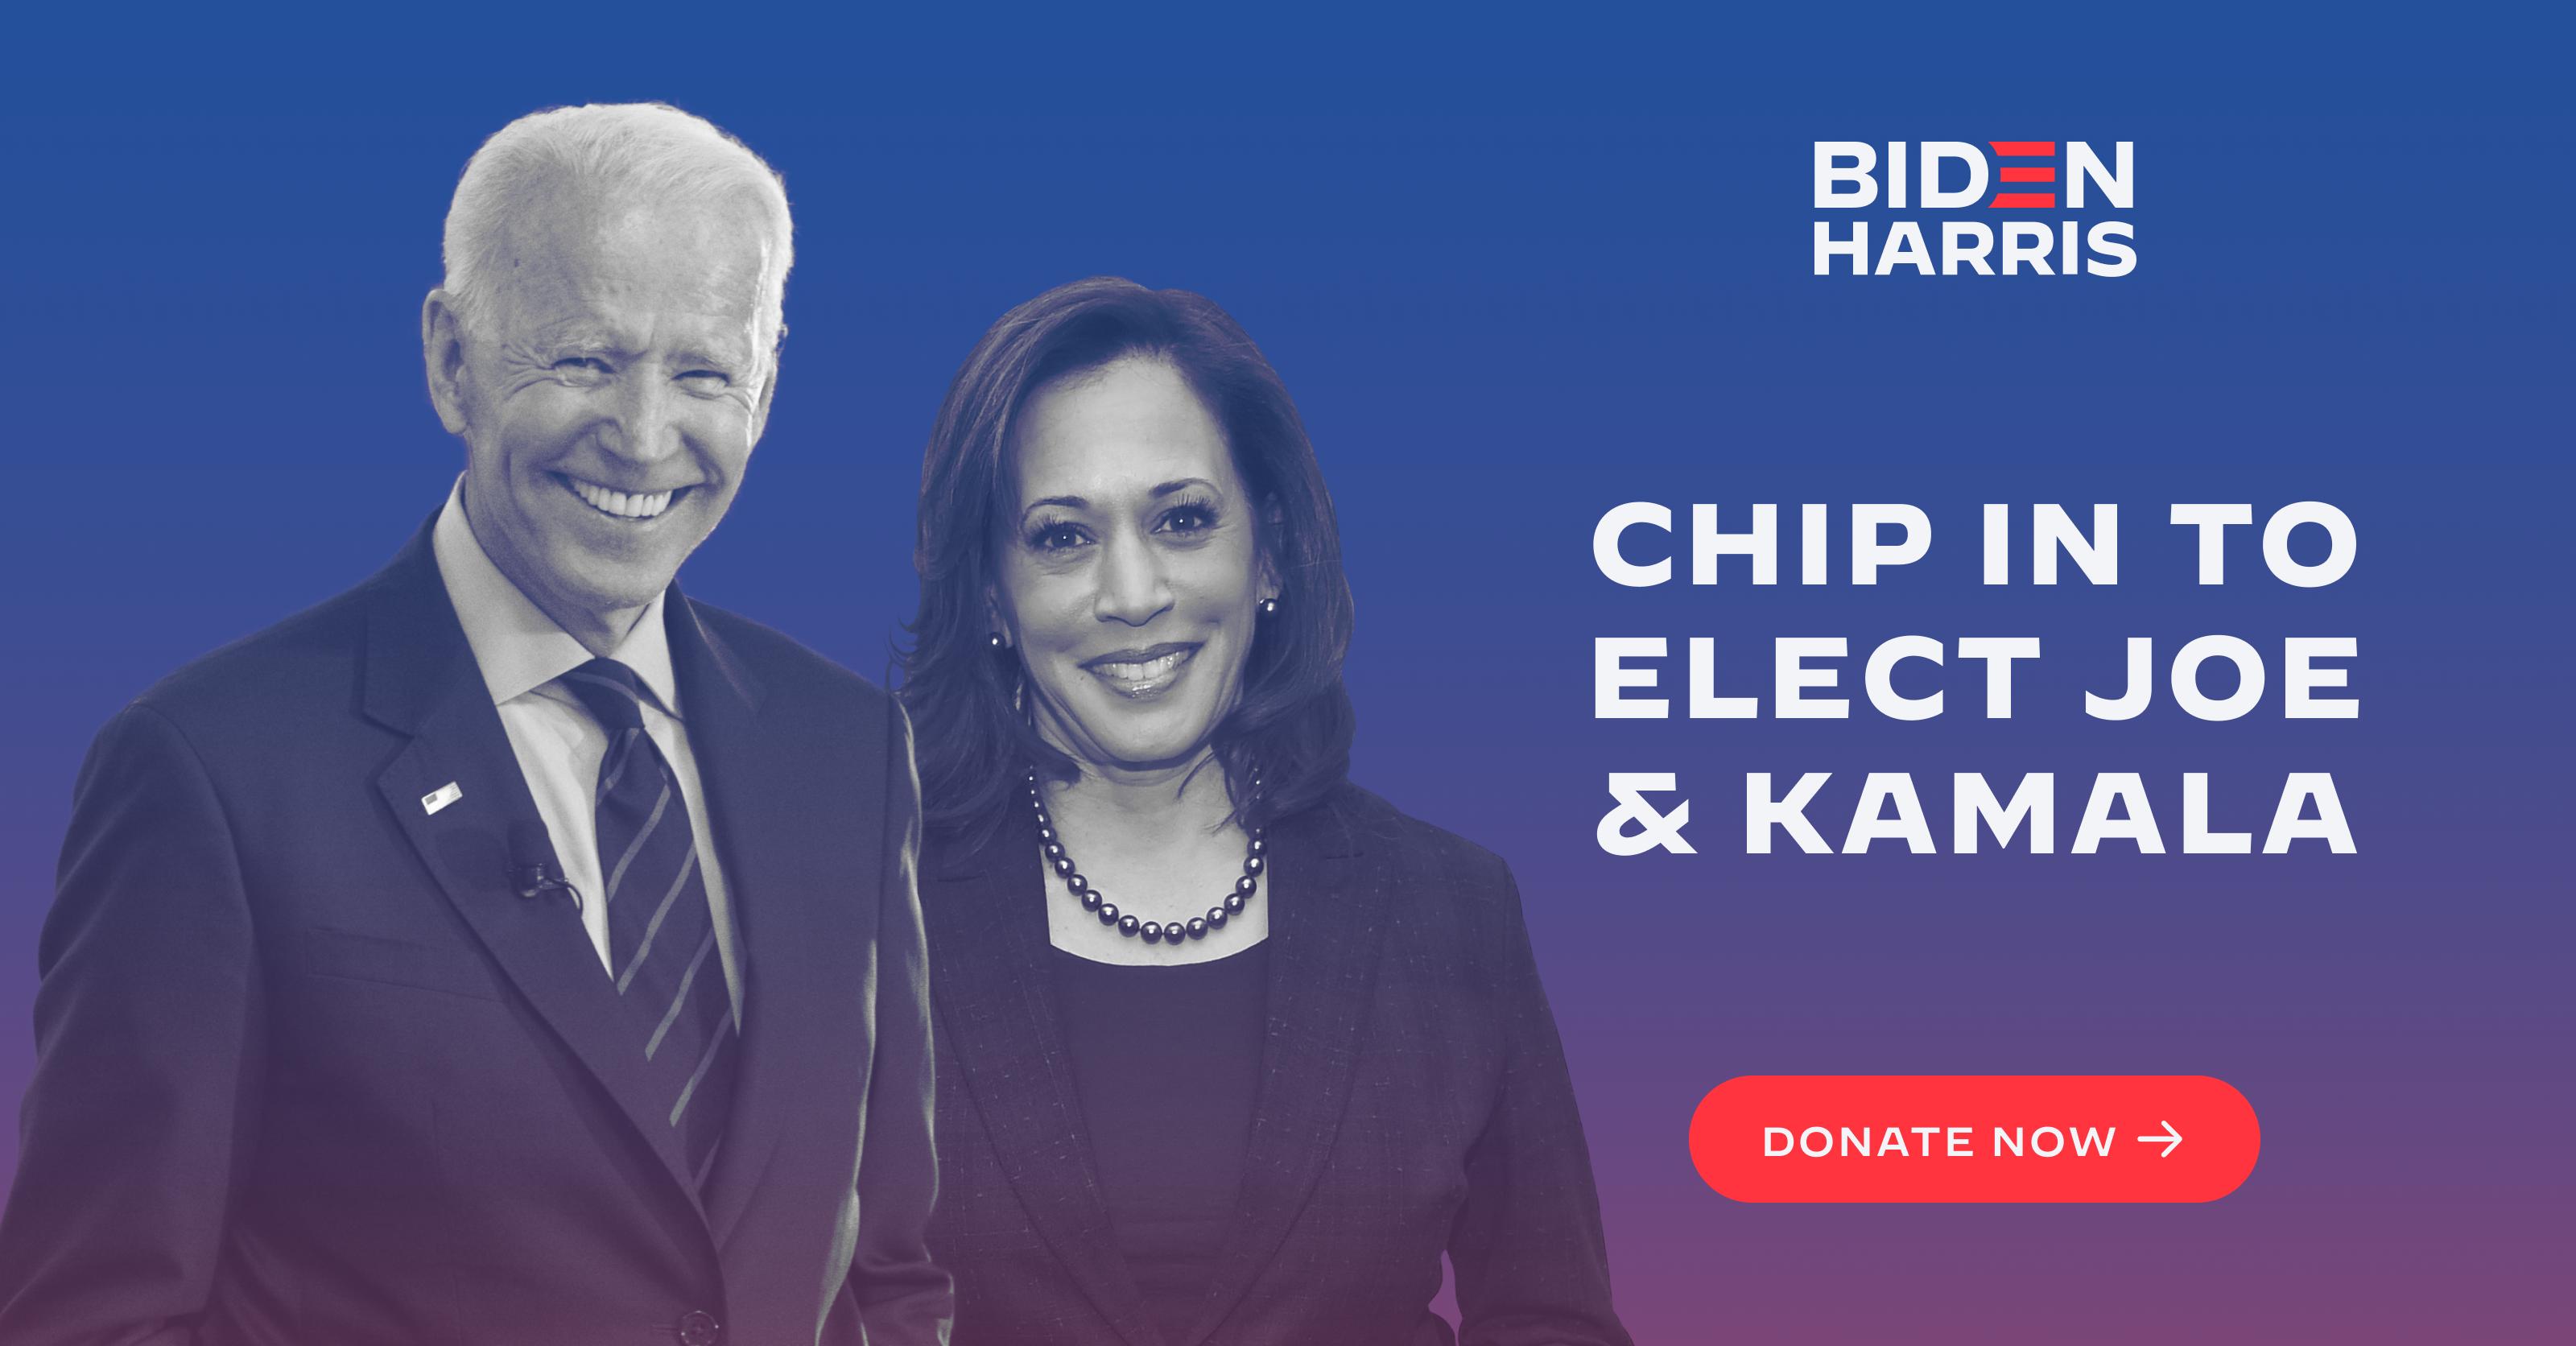 Chip in to elect Joe Biden and Kamala Harris